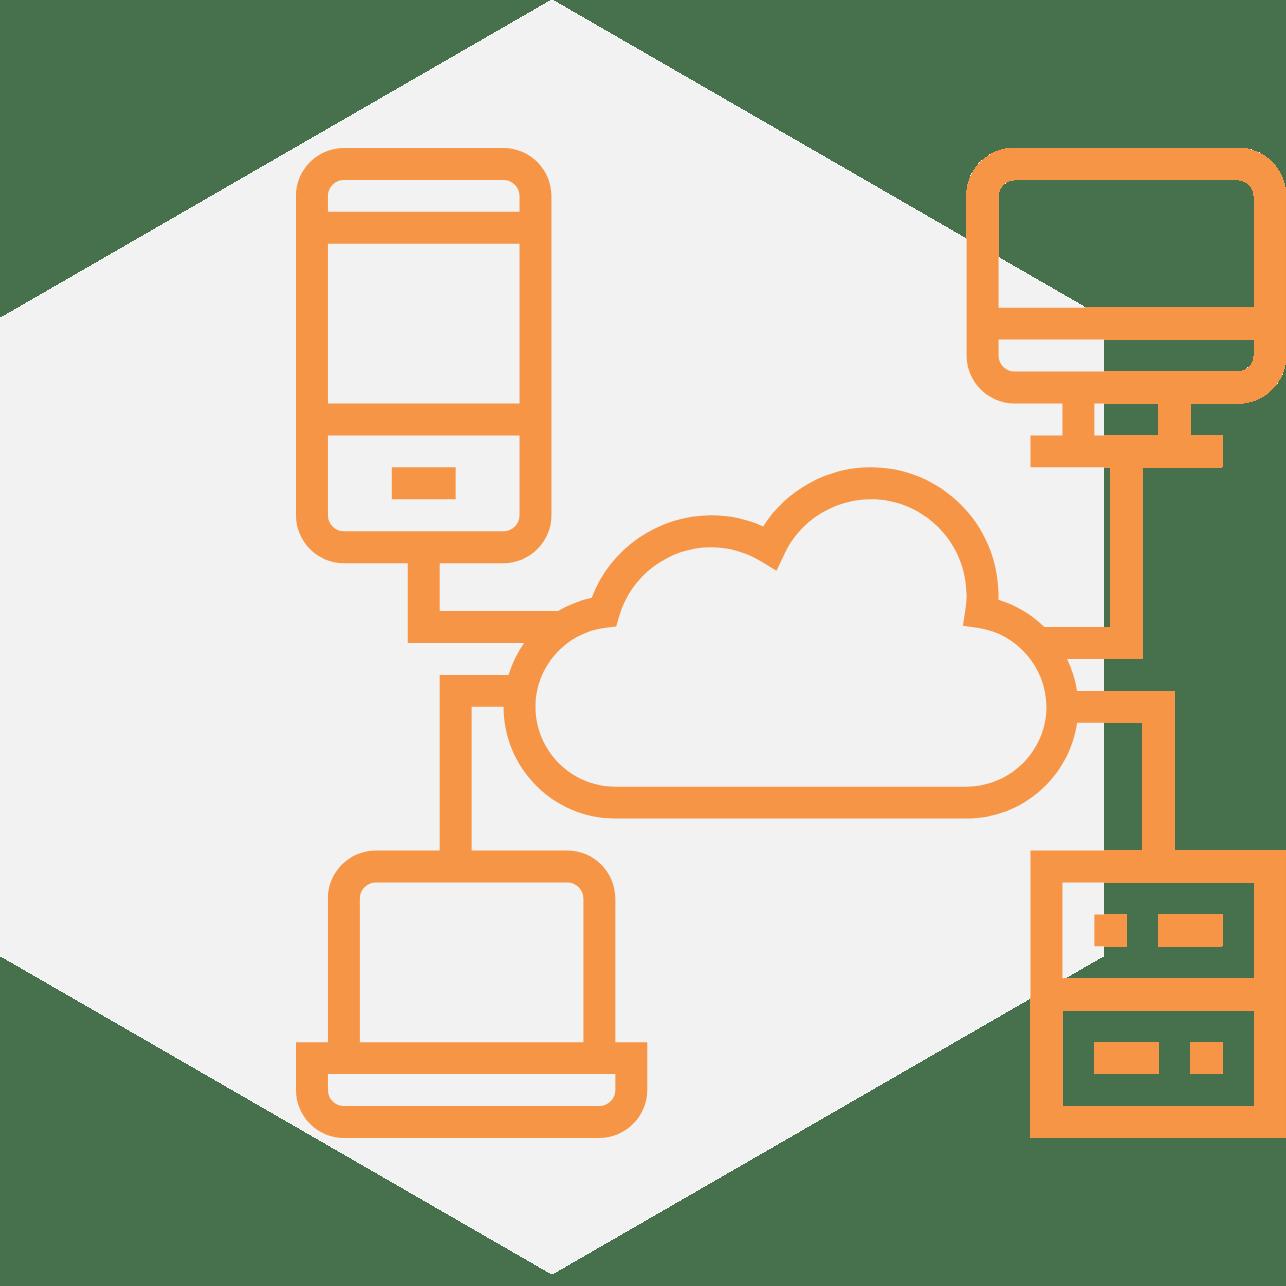 network pt icon